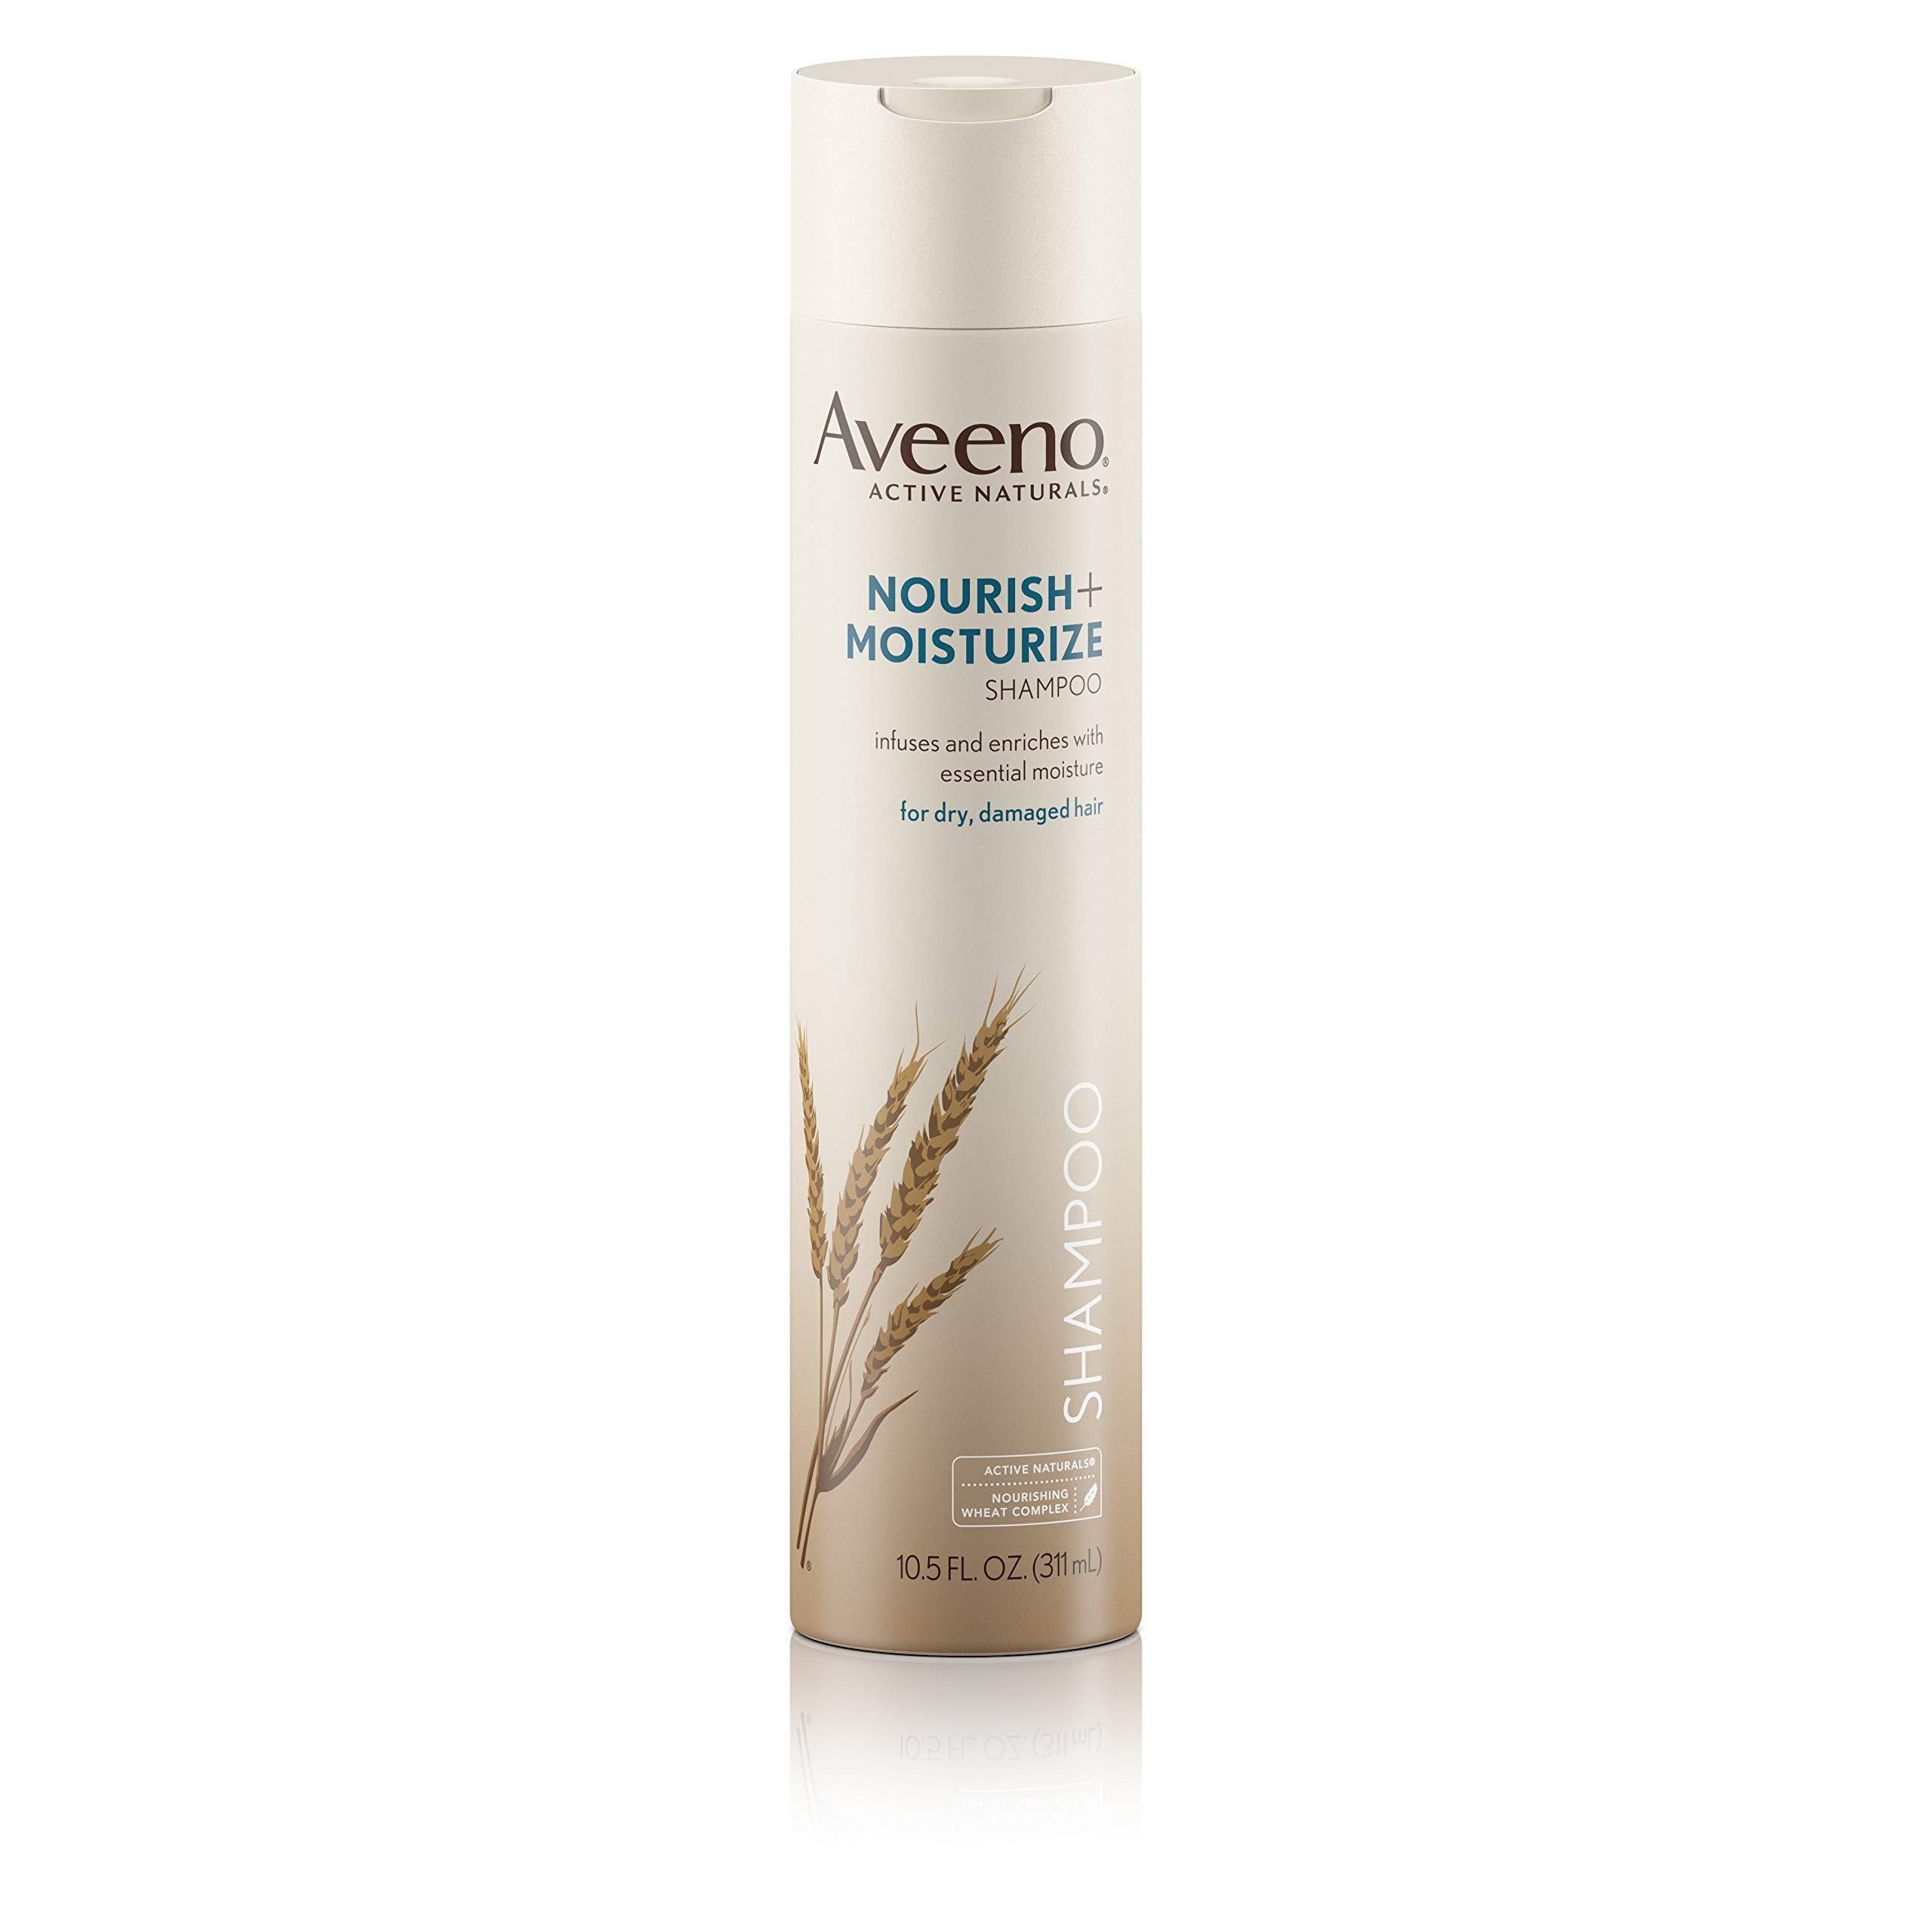 Aveeno Nourish+ Moisturize Shampoo, 10.5 Fl. Oz by Aveeno